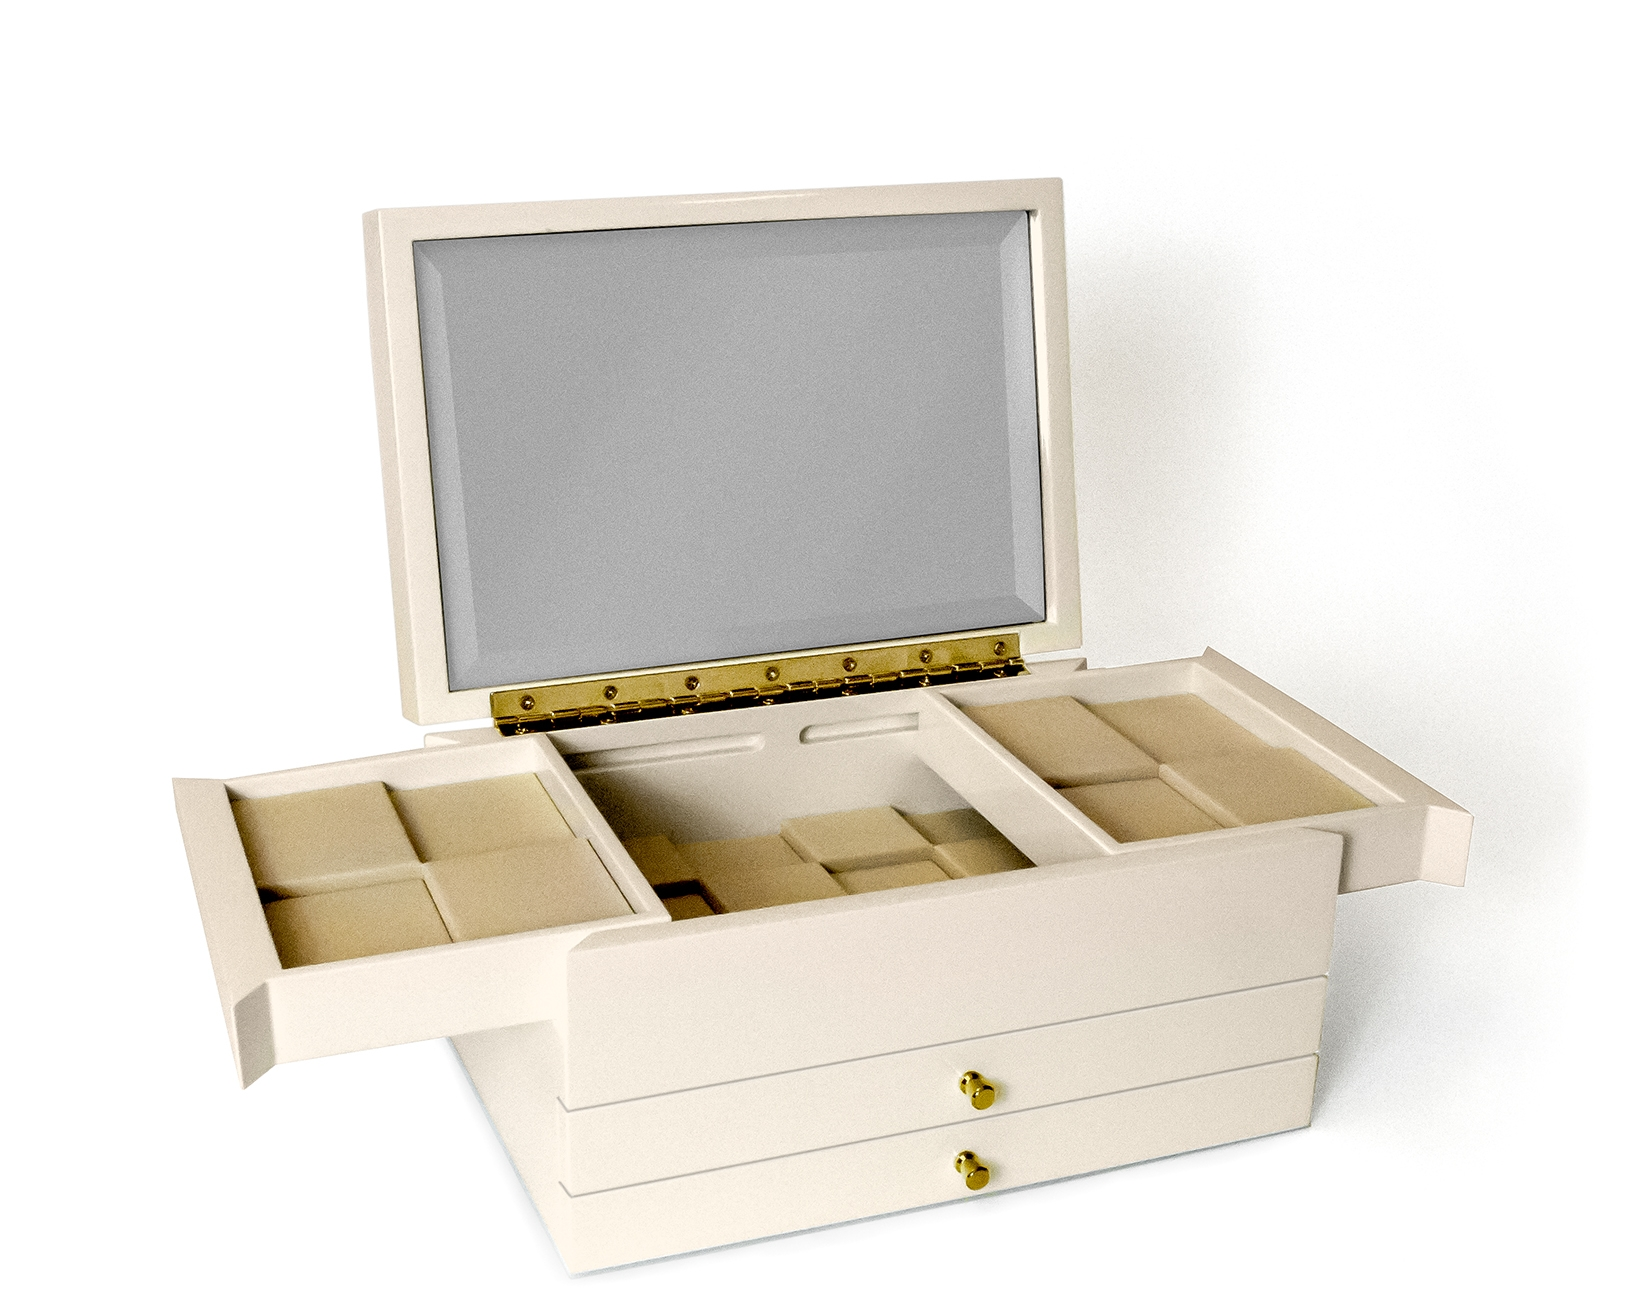 MG14-JD046 charm jewelry box-slides open.jpg